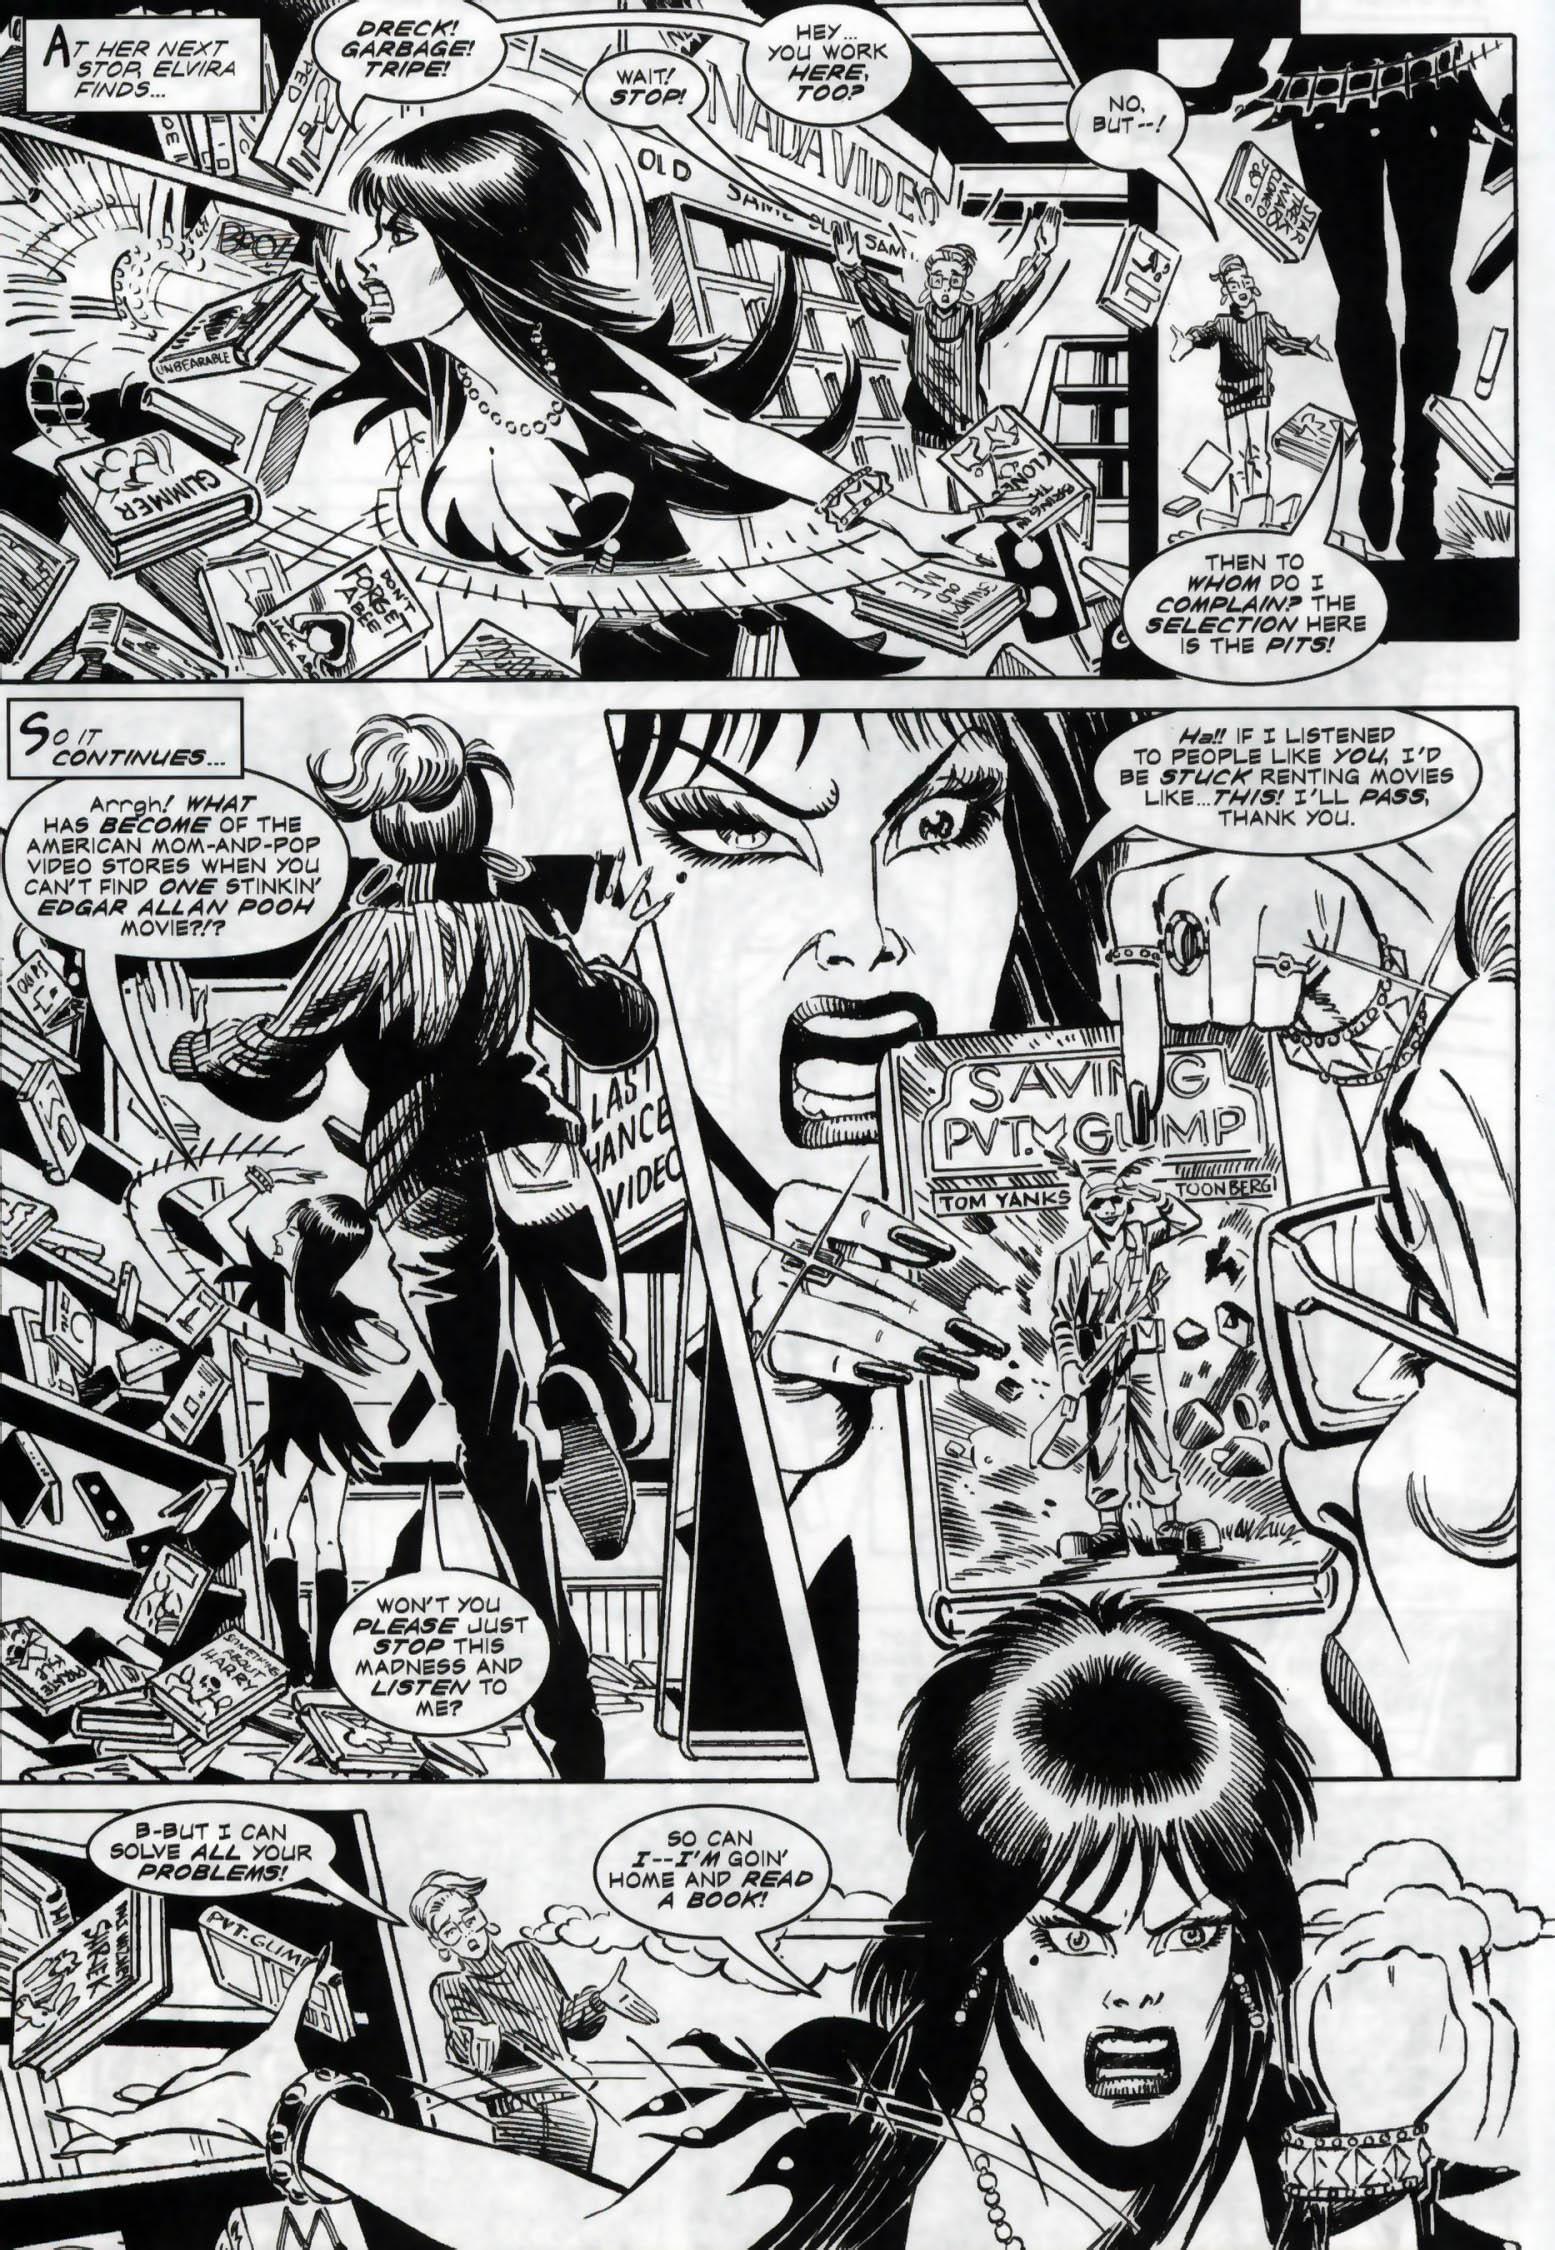 Read online Elvira, Mistress of the Dark comic -  Issue #118 - 4